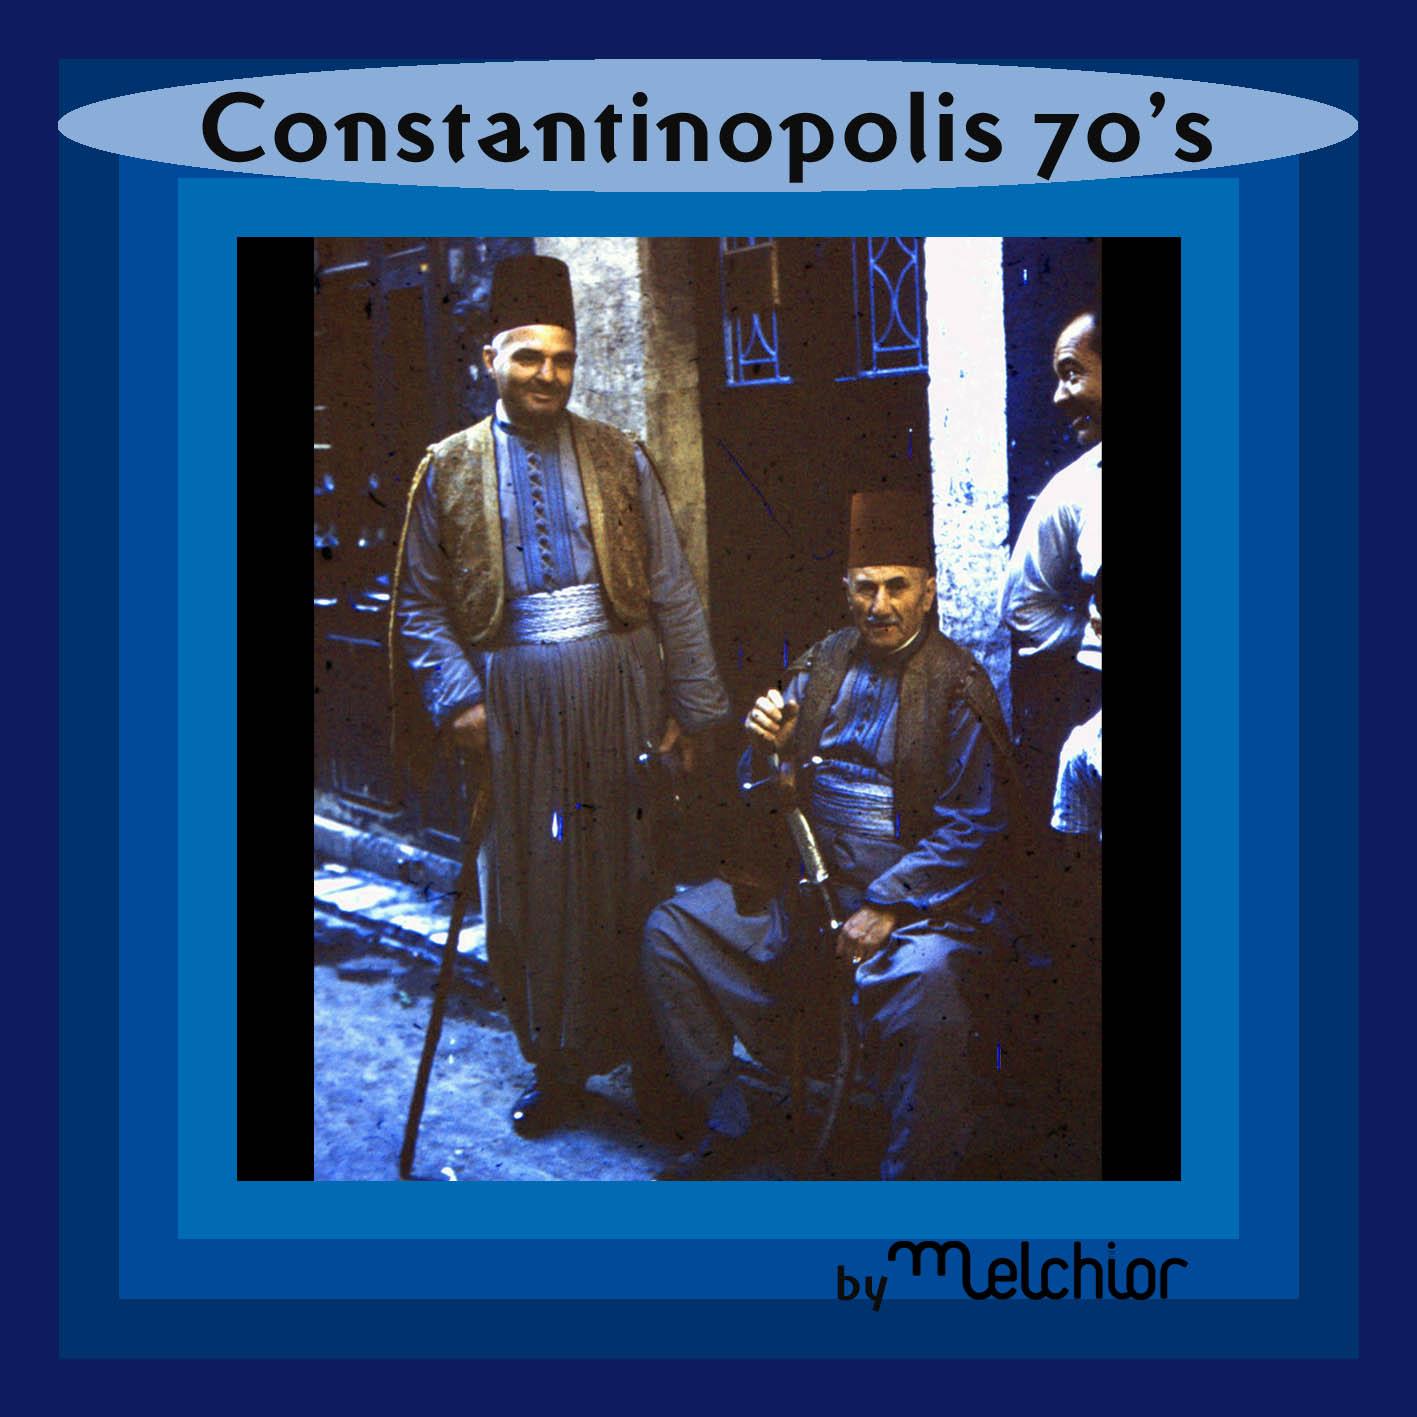 http://www.mixcloud.com/melchior71/constantinopolis-70s/